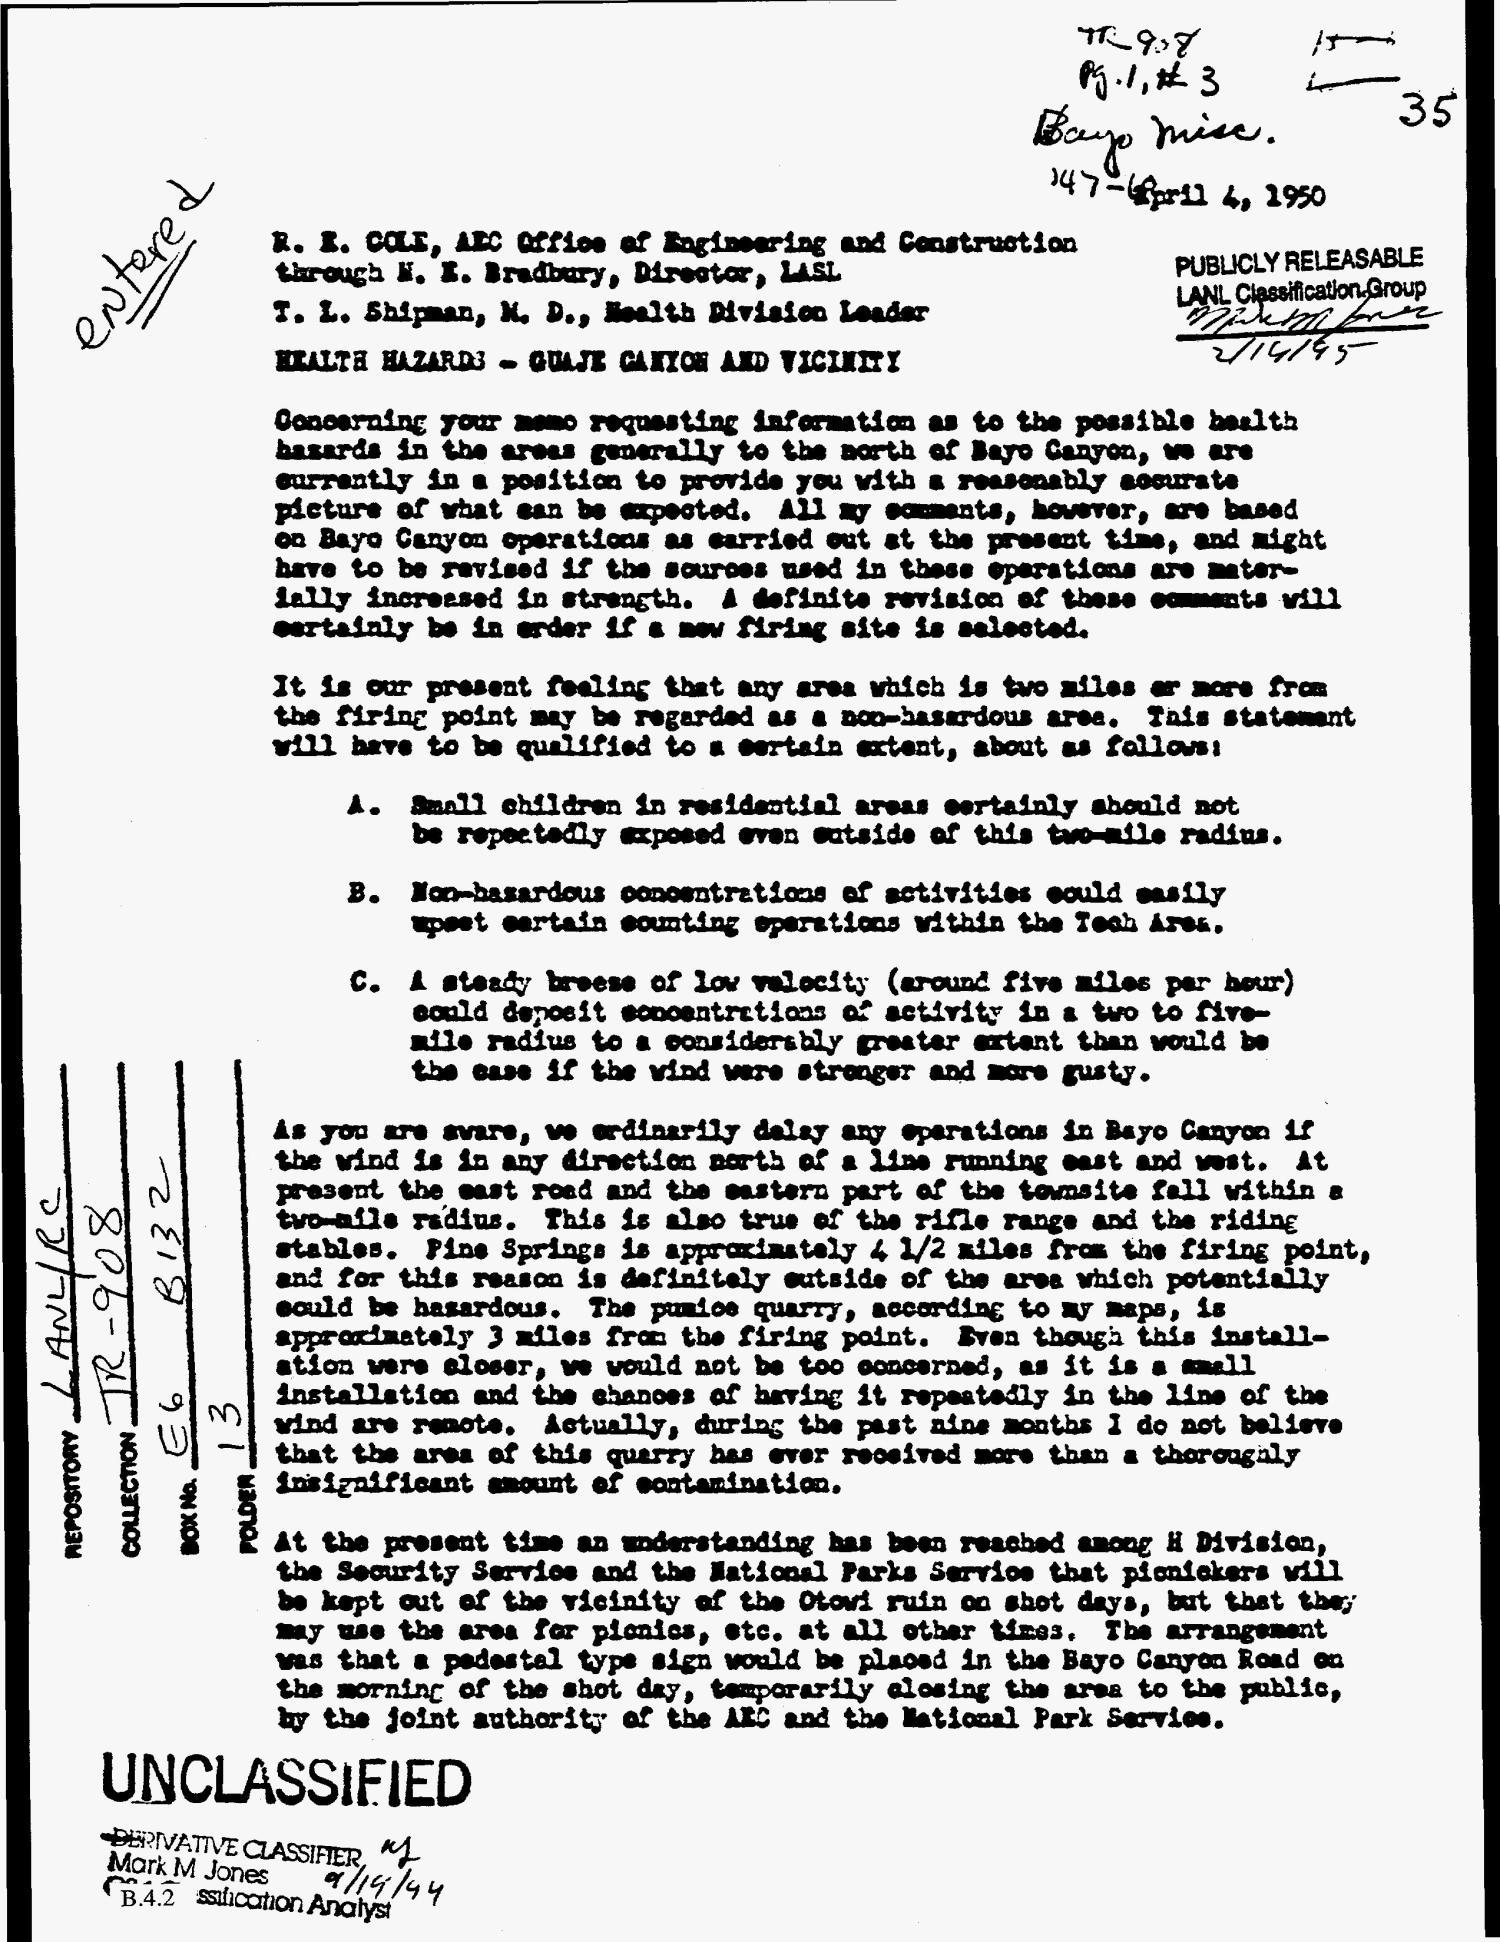 the bayo canyon radioactive lanthanum rala program page 82 of Mark 84 Wreck the bayo canyon radioactive lanthanum rala program page 82 of 108 digital library